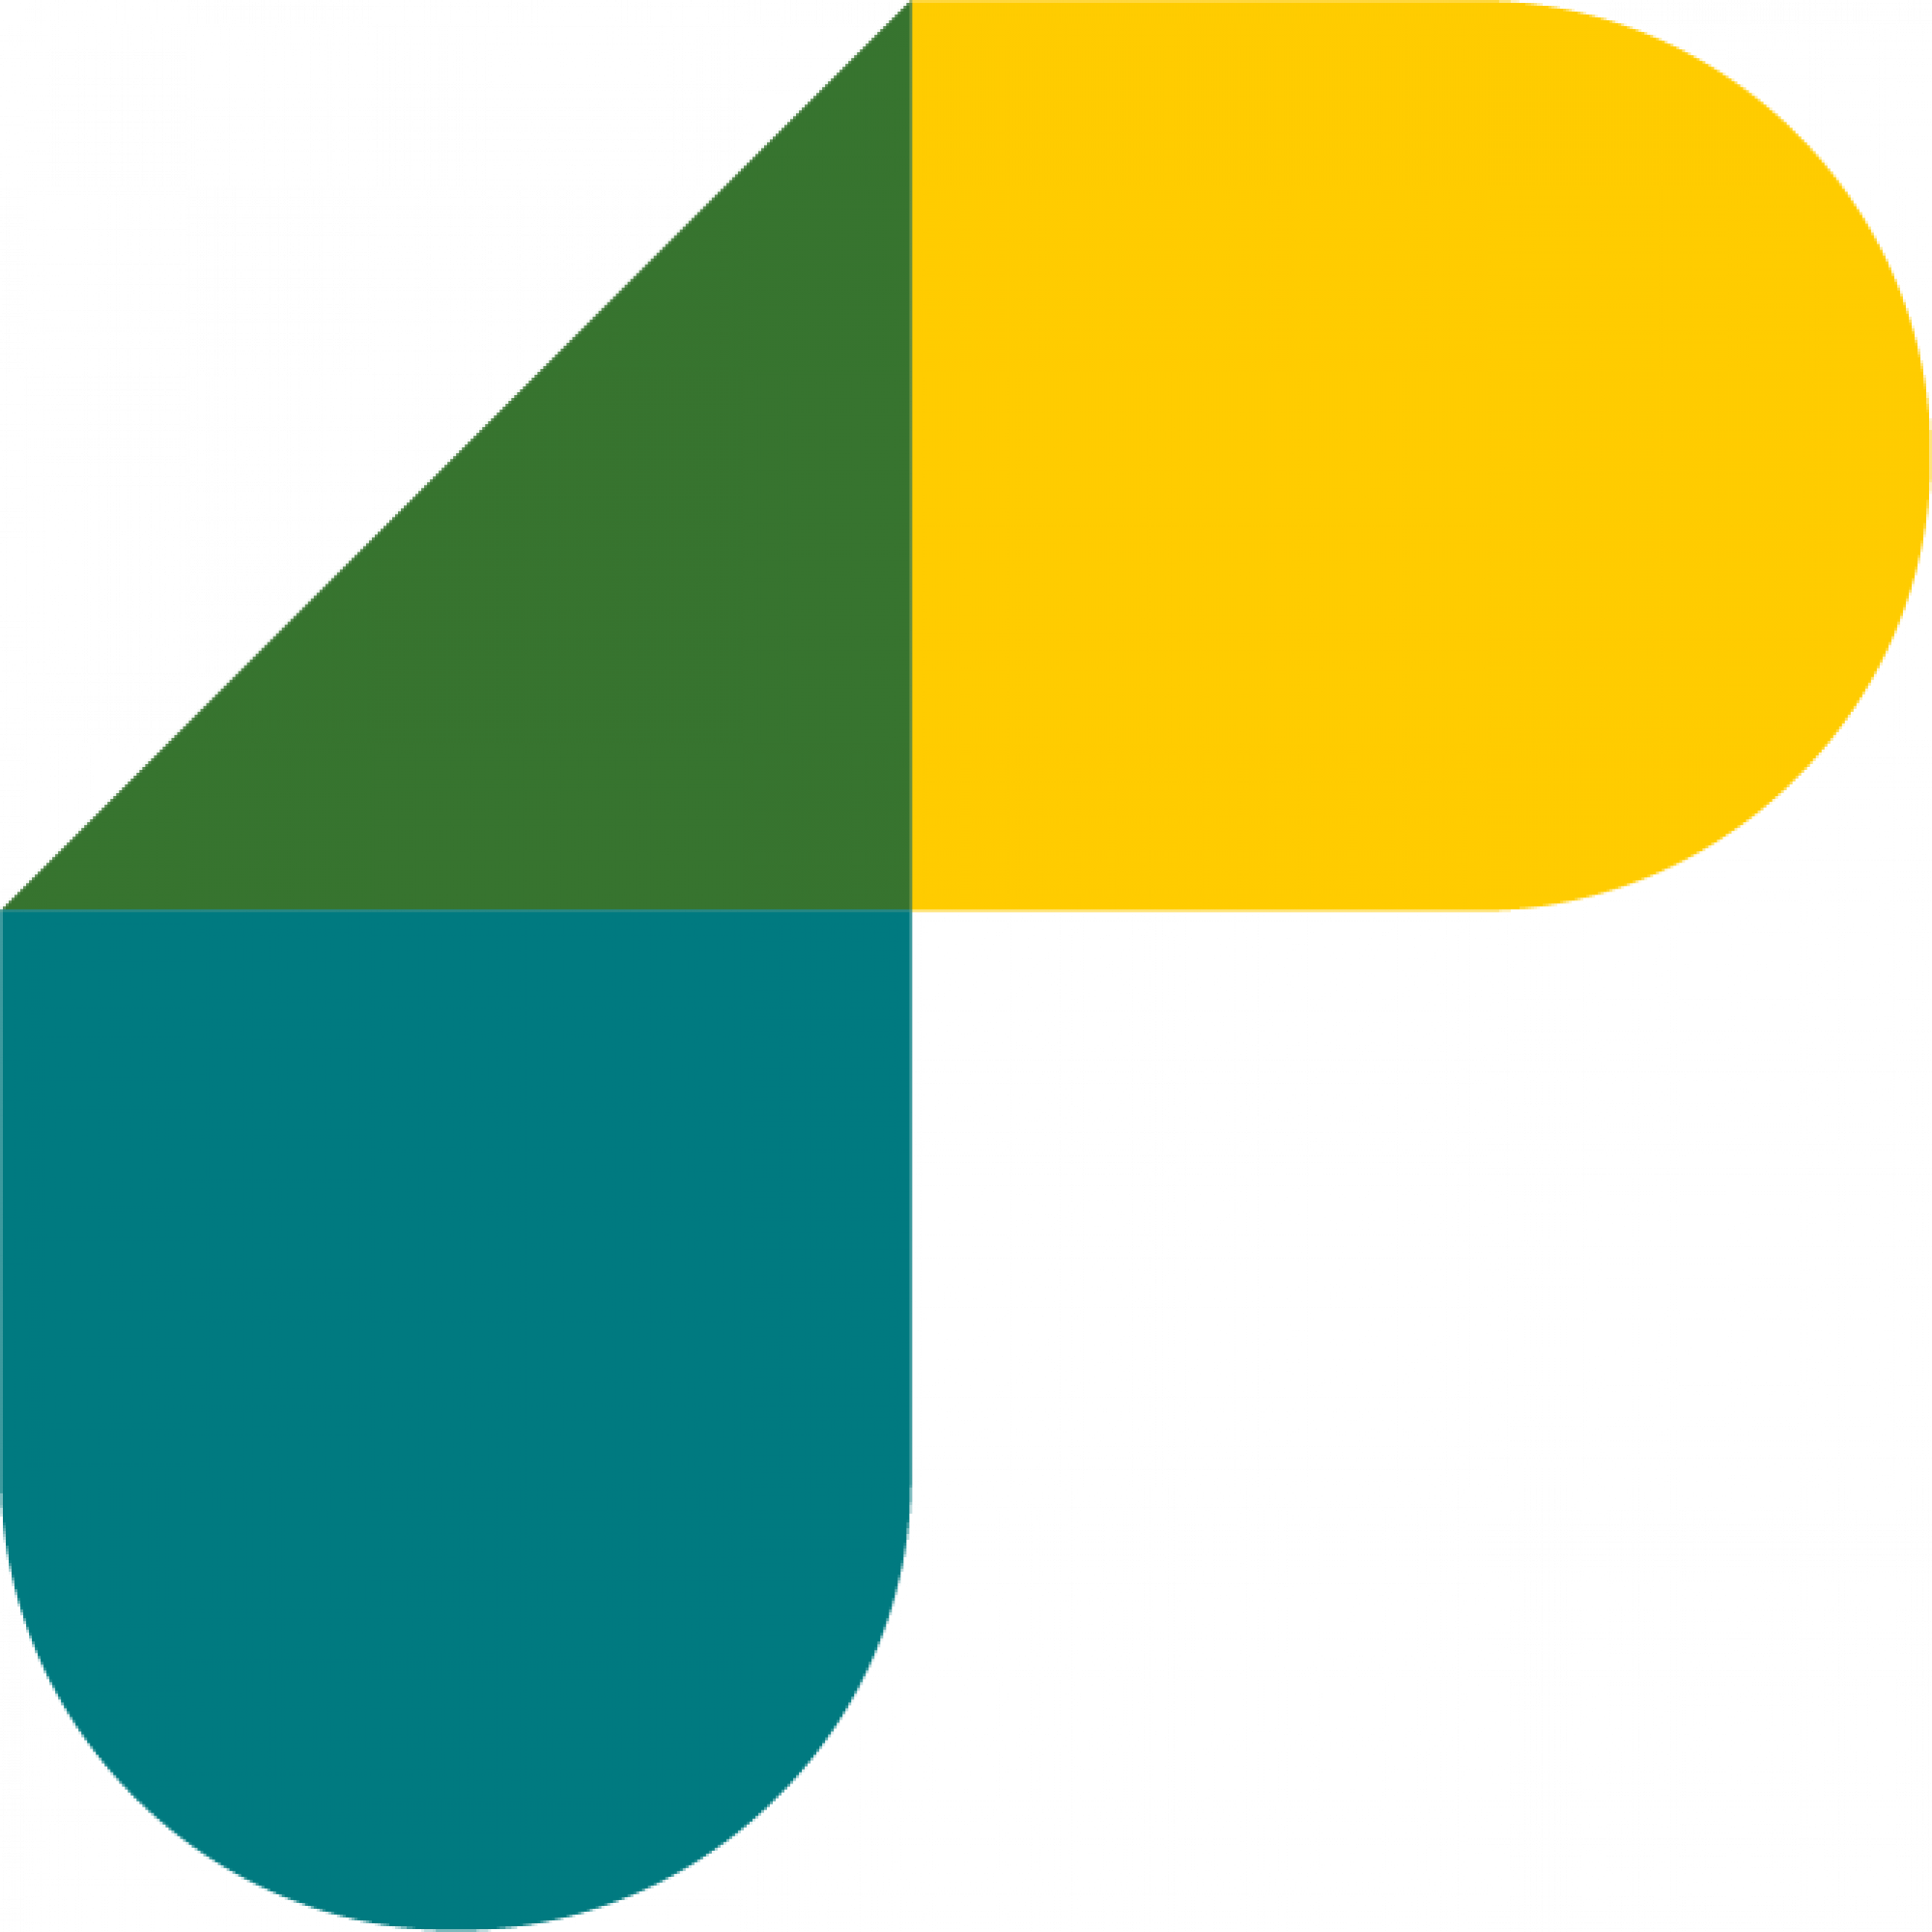 Gestaltungselement-RGB